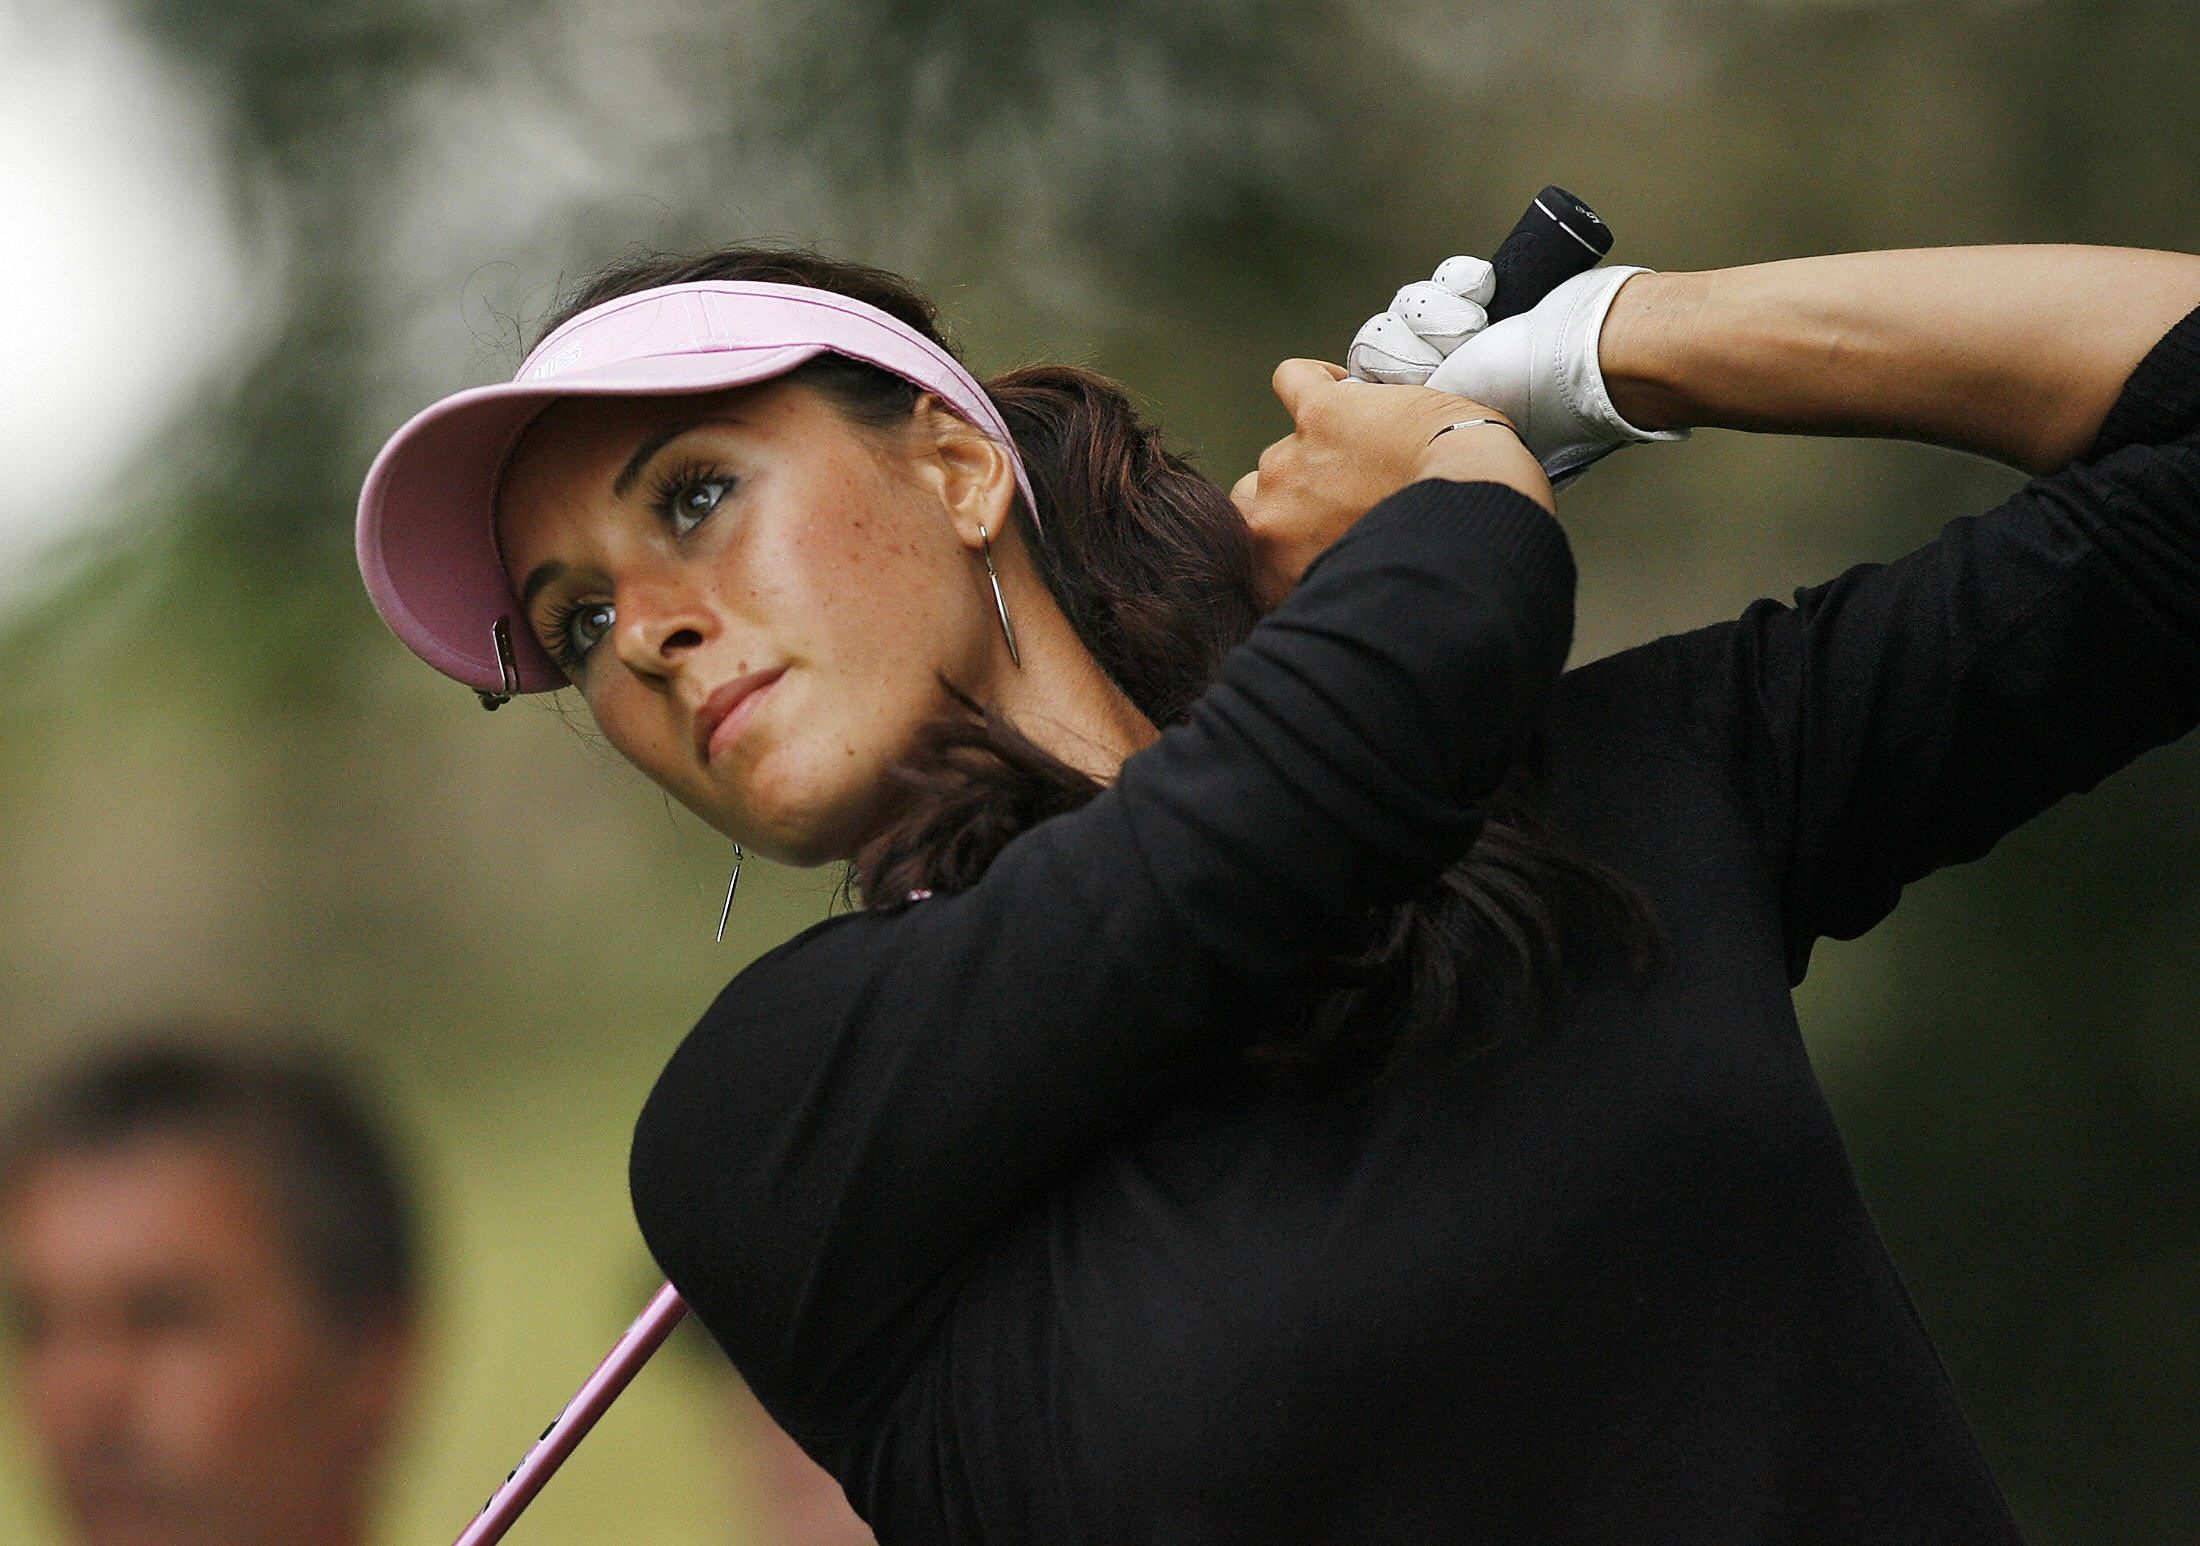 Russian golfer Maria Verchenova watches